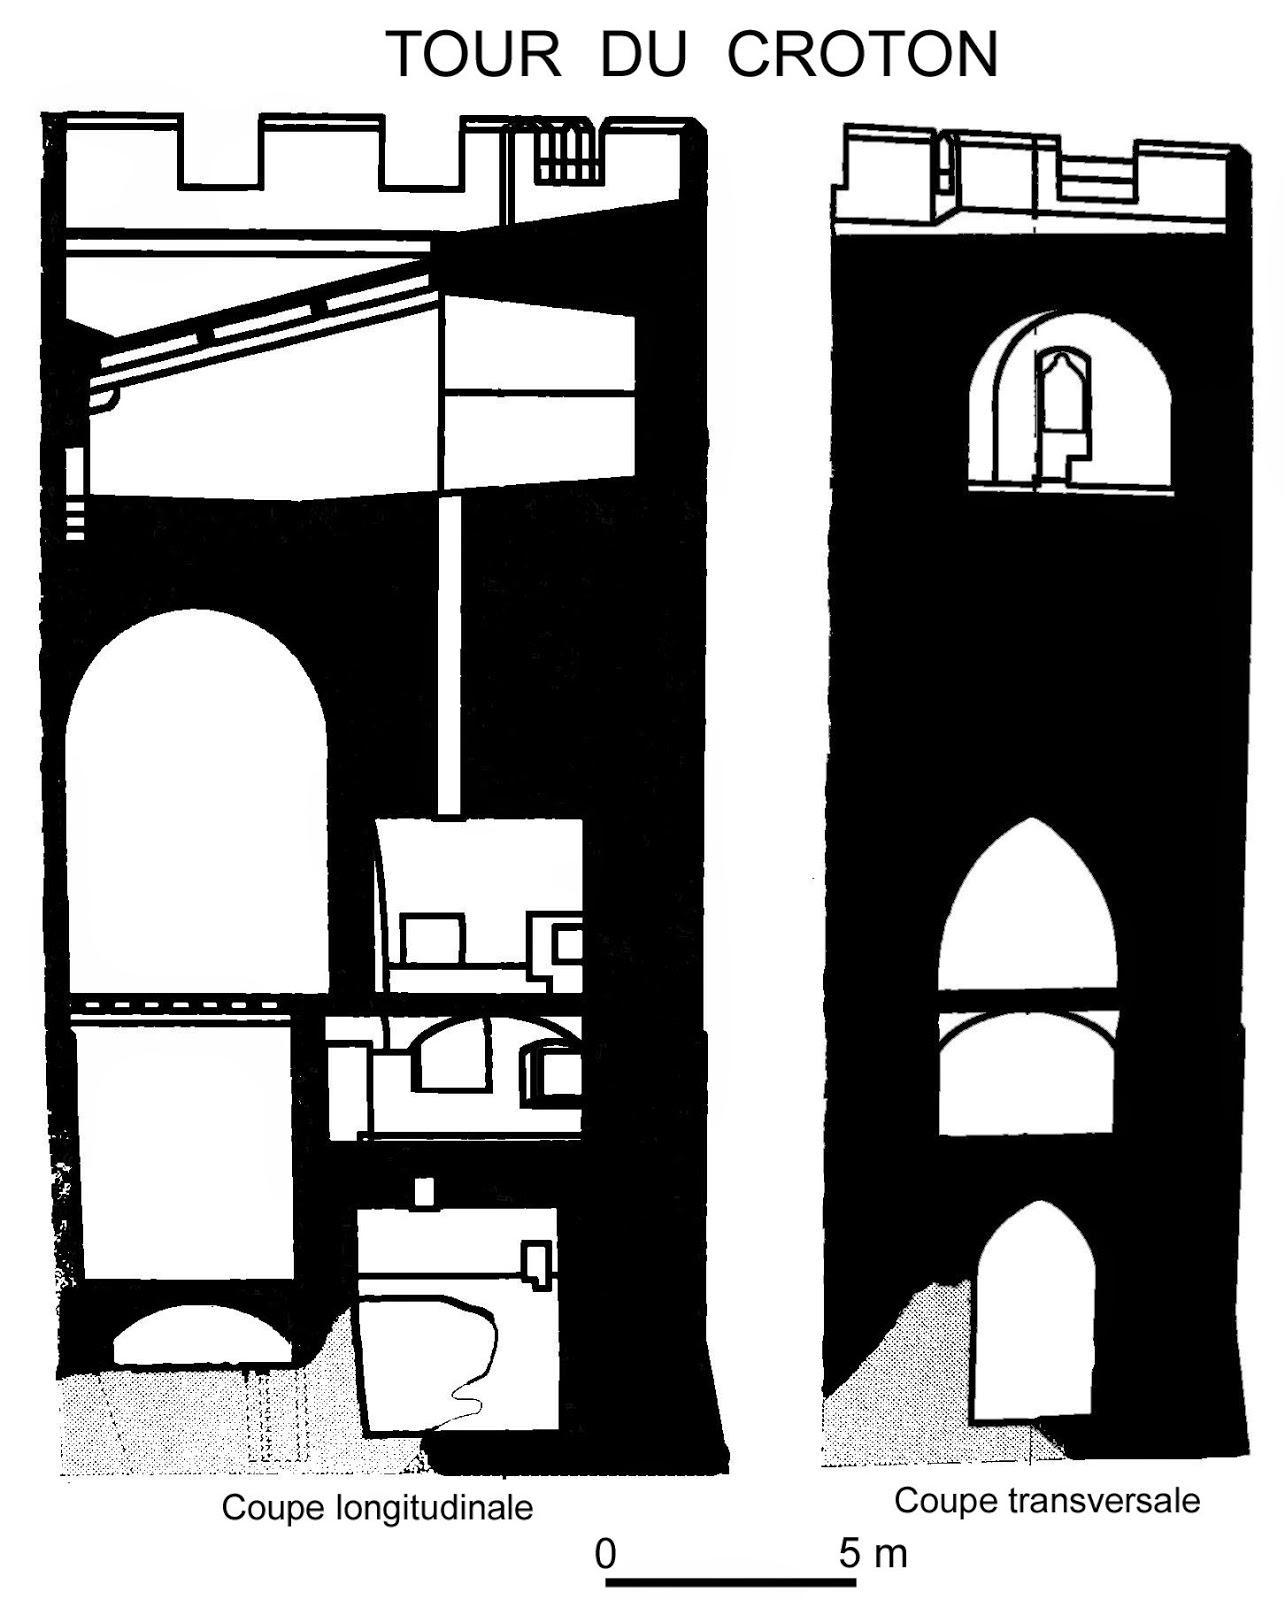 CREST (26) - Le donjon